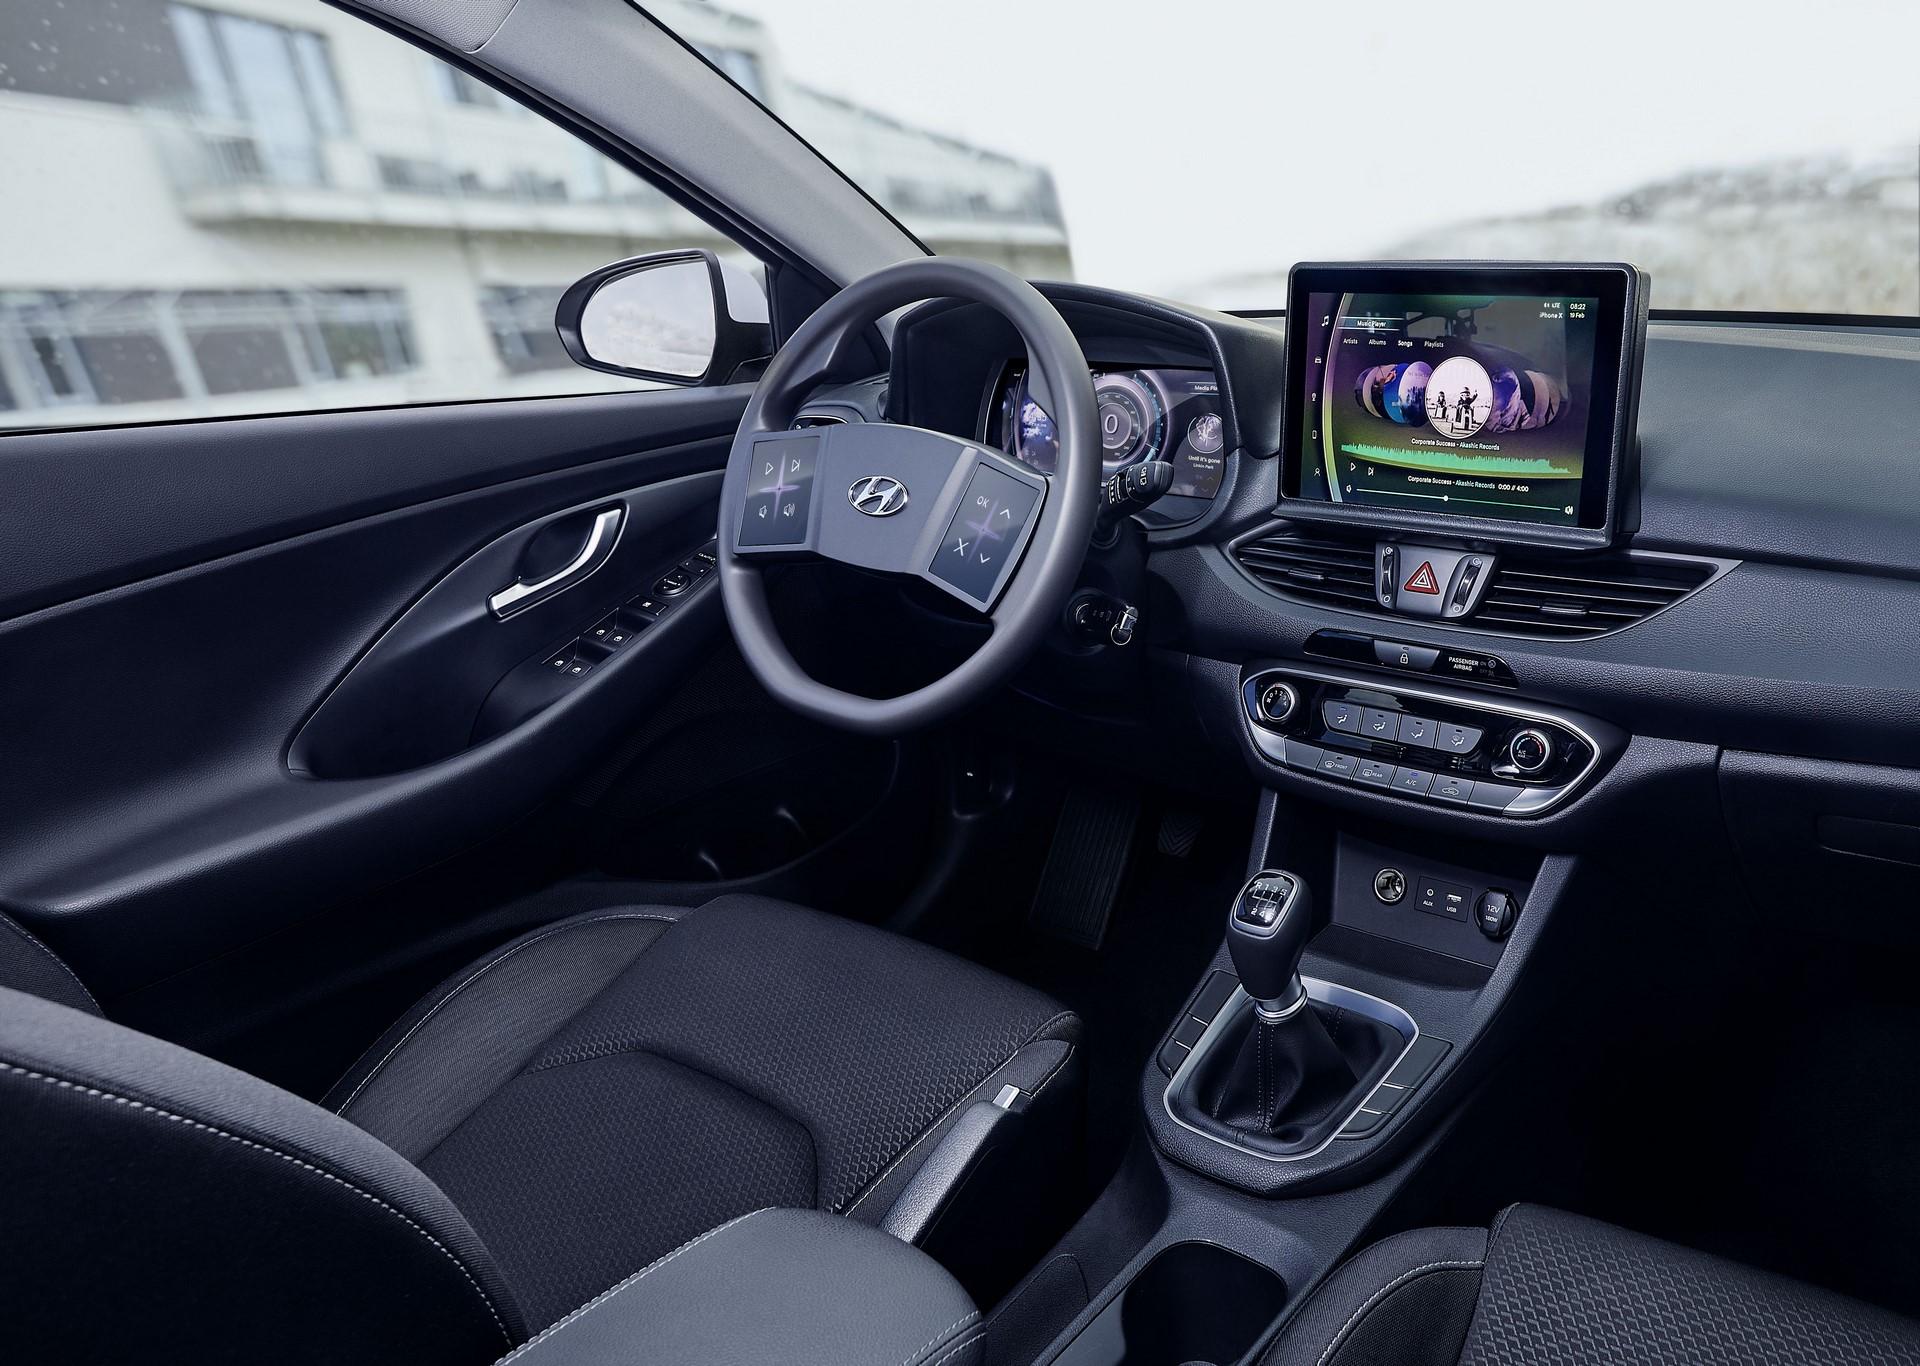 Hyundai-Virtual-cockpit-2019-Hyundai_TechDay_i30_Workshop_238-3